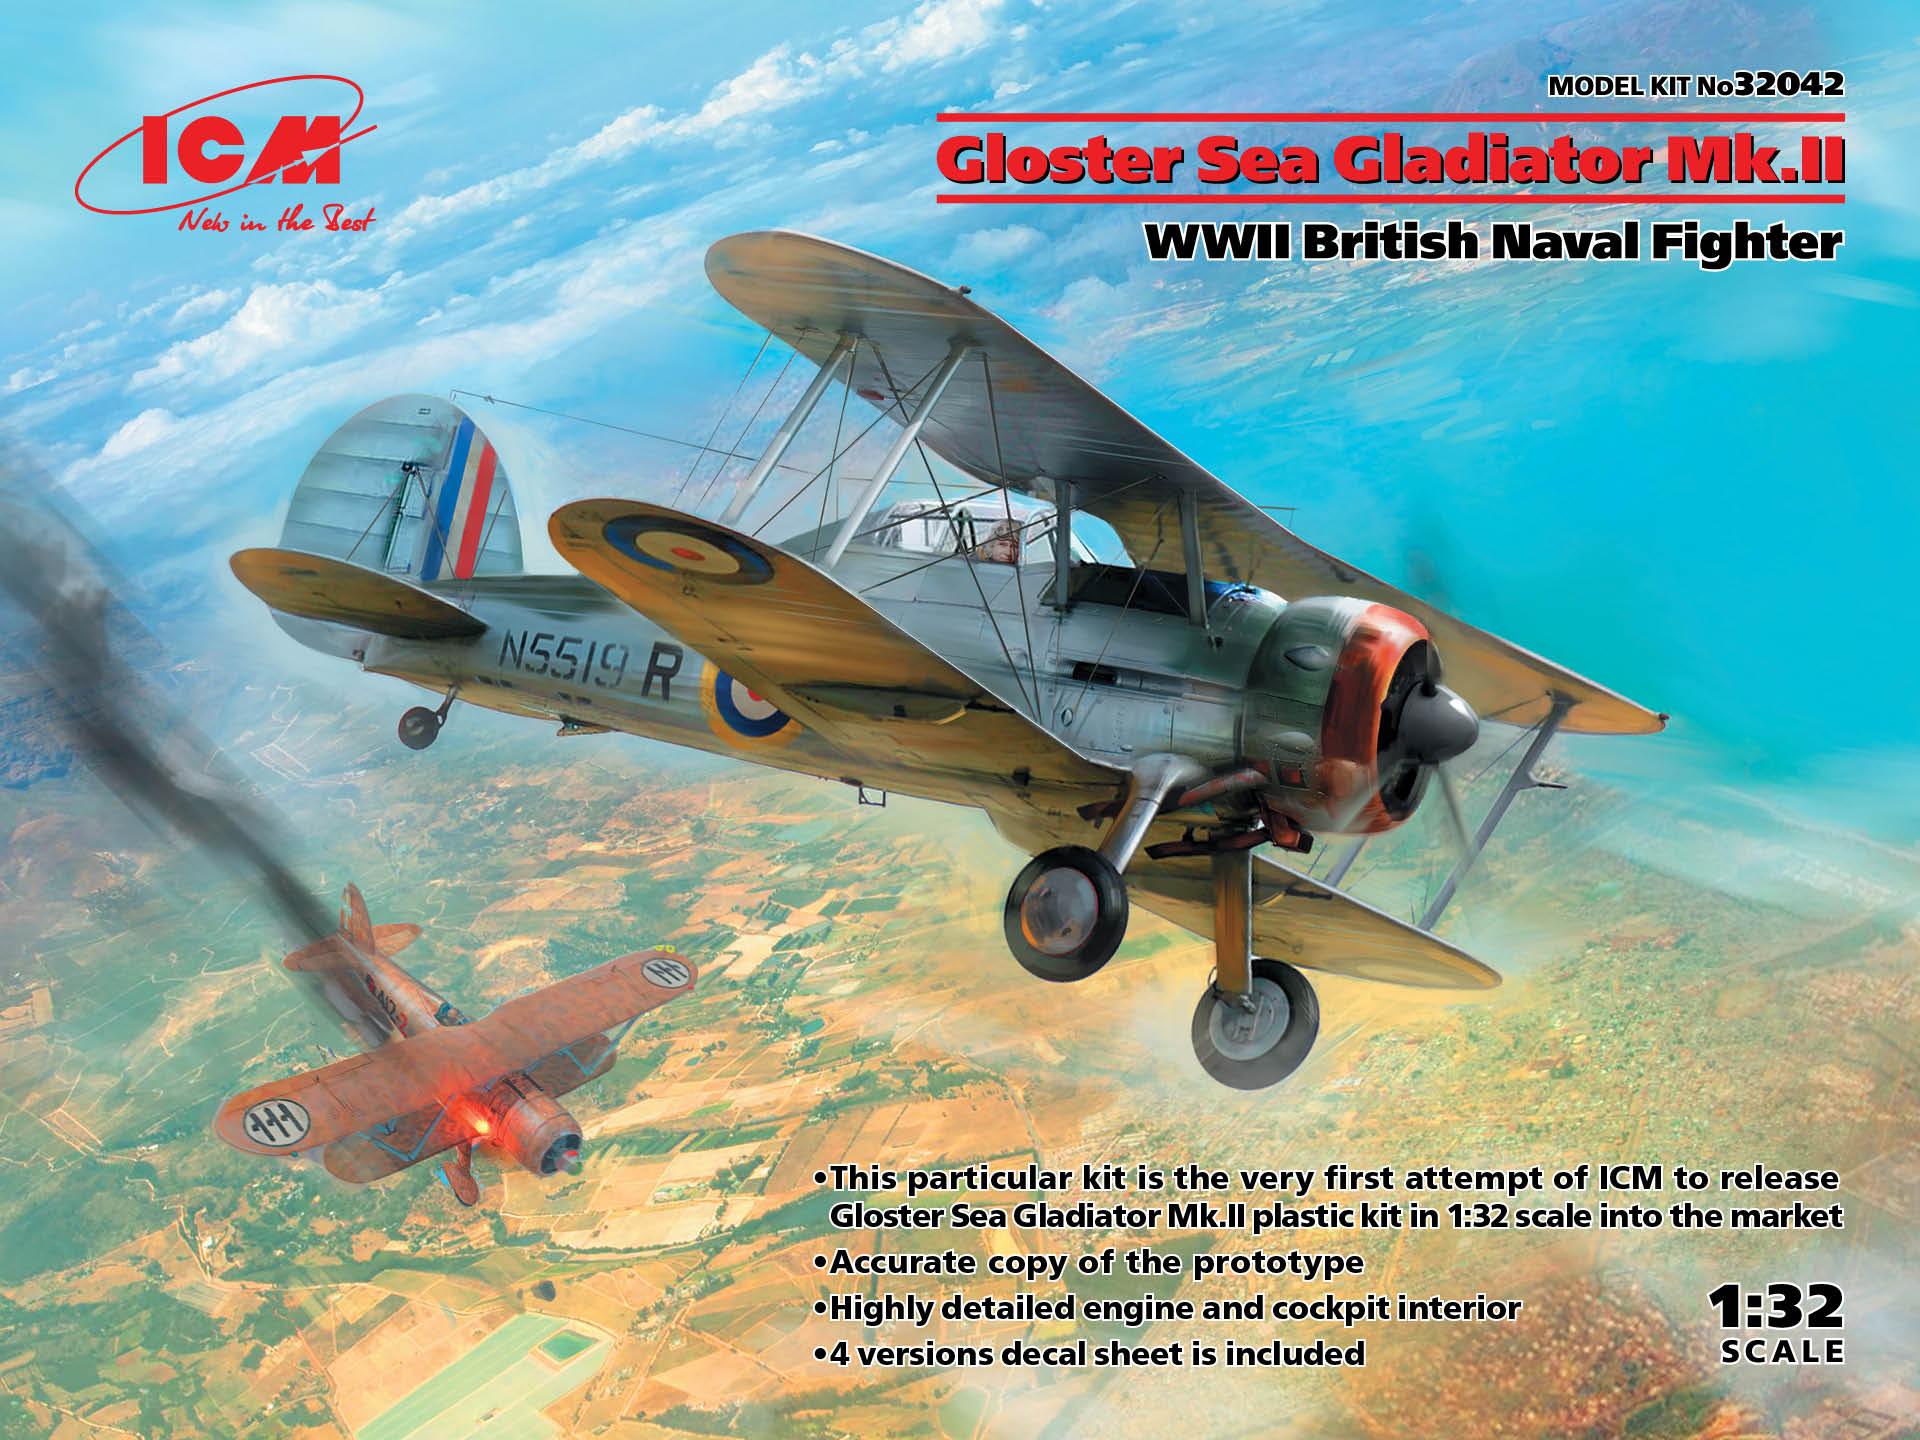 ICM 1/32 Gloster Sea Gladiator Mk.II, WWII British Naval Fighter